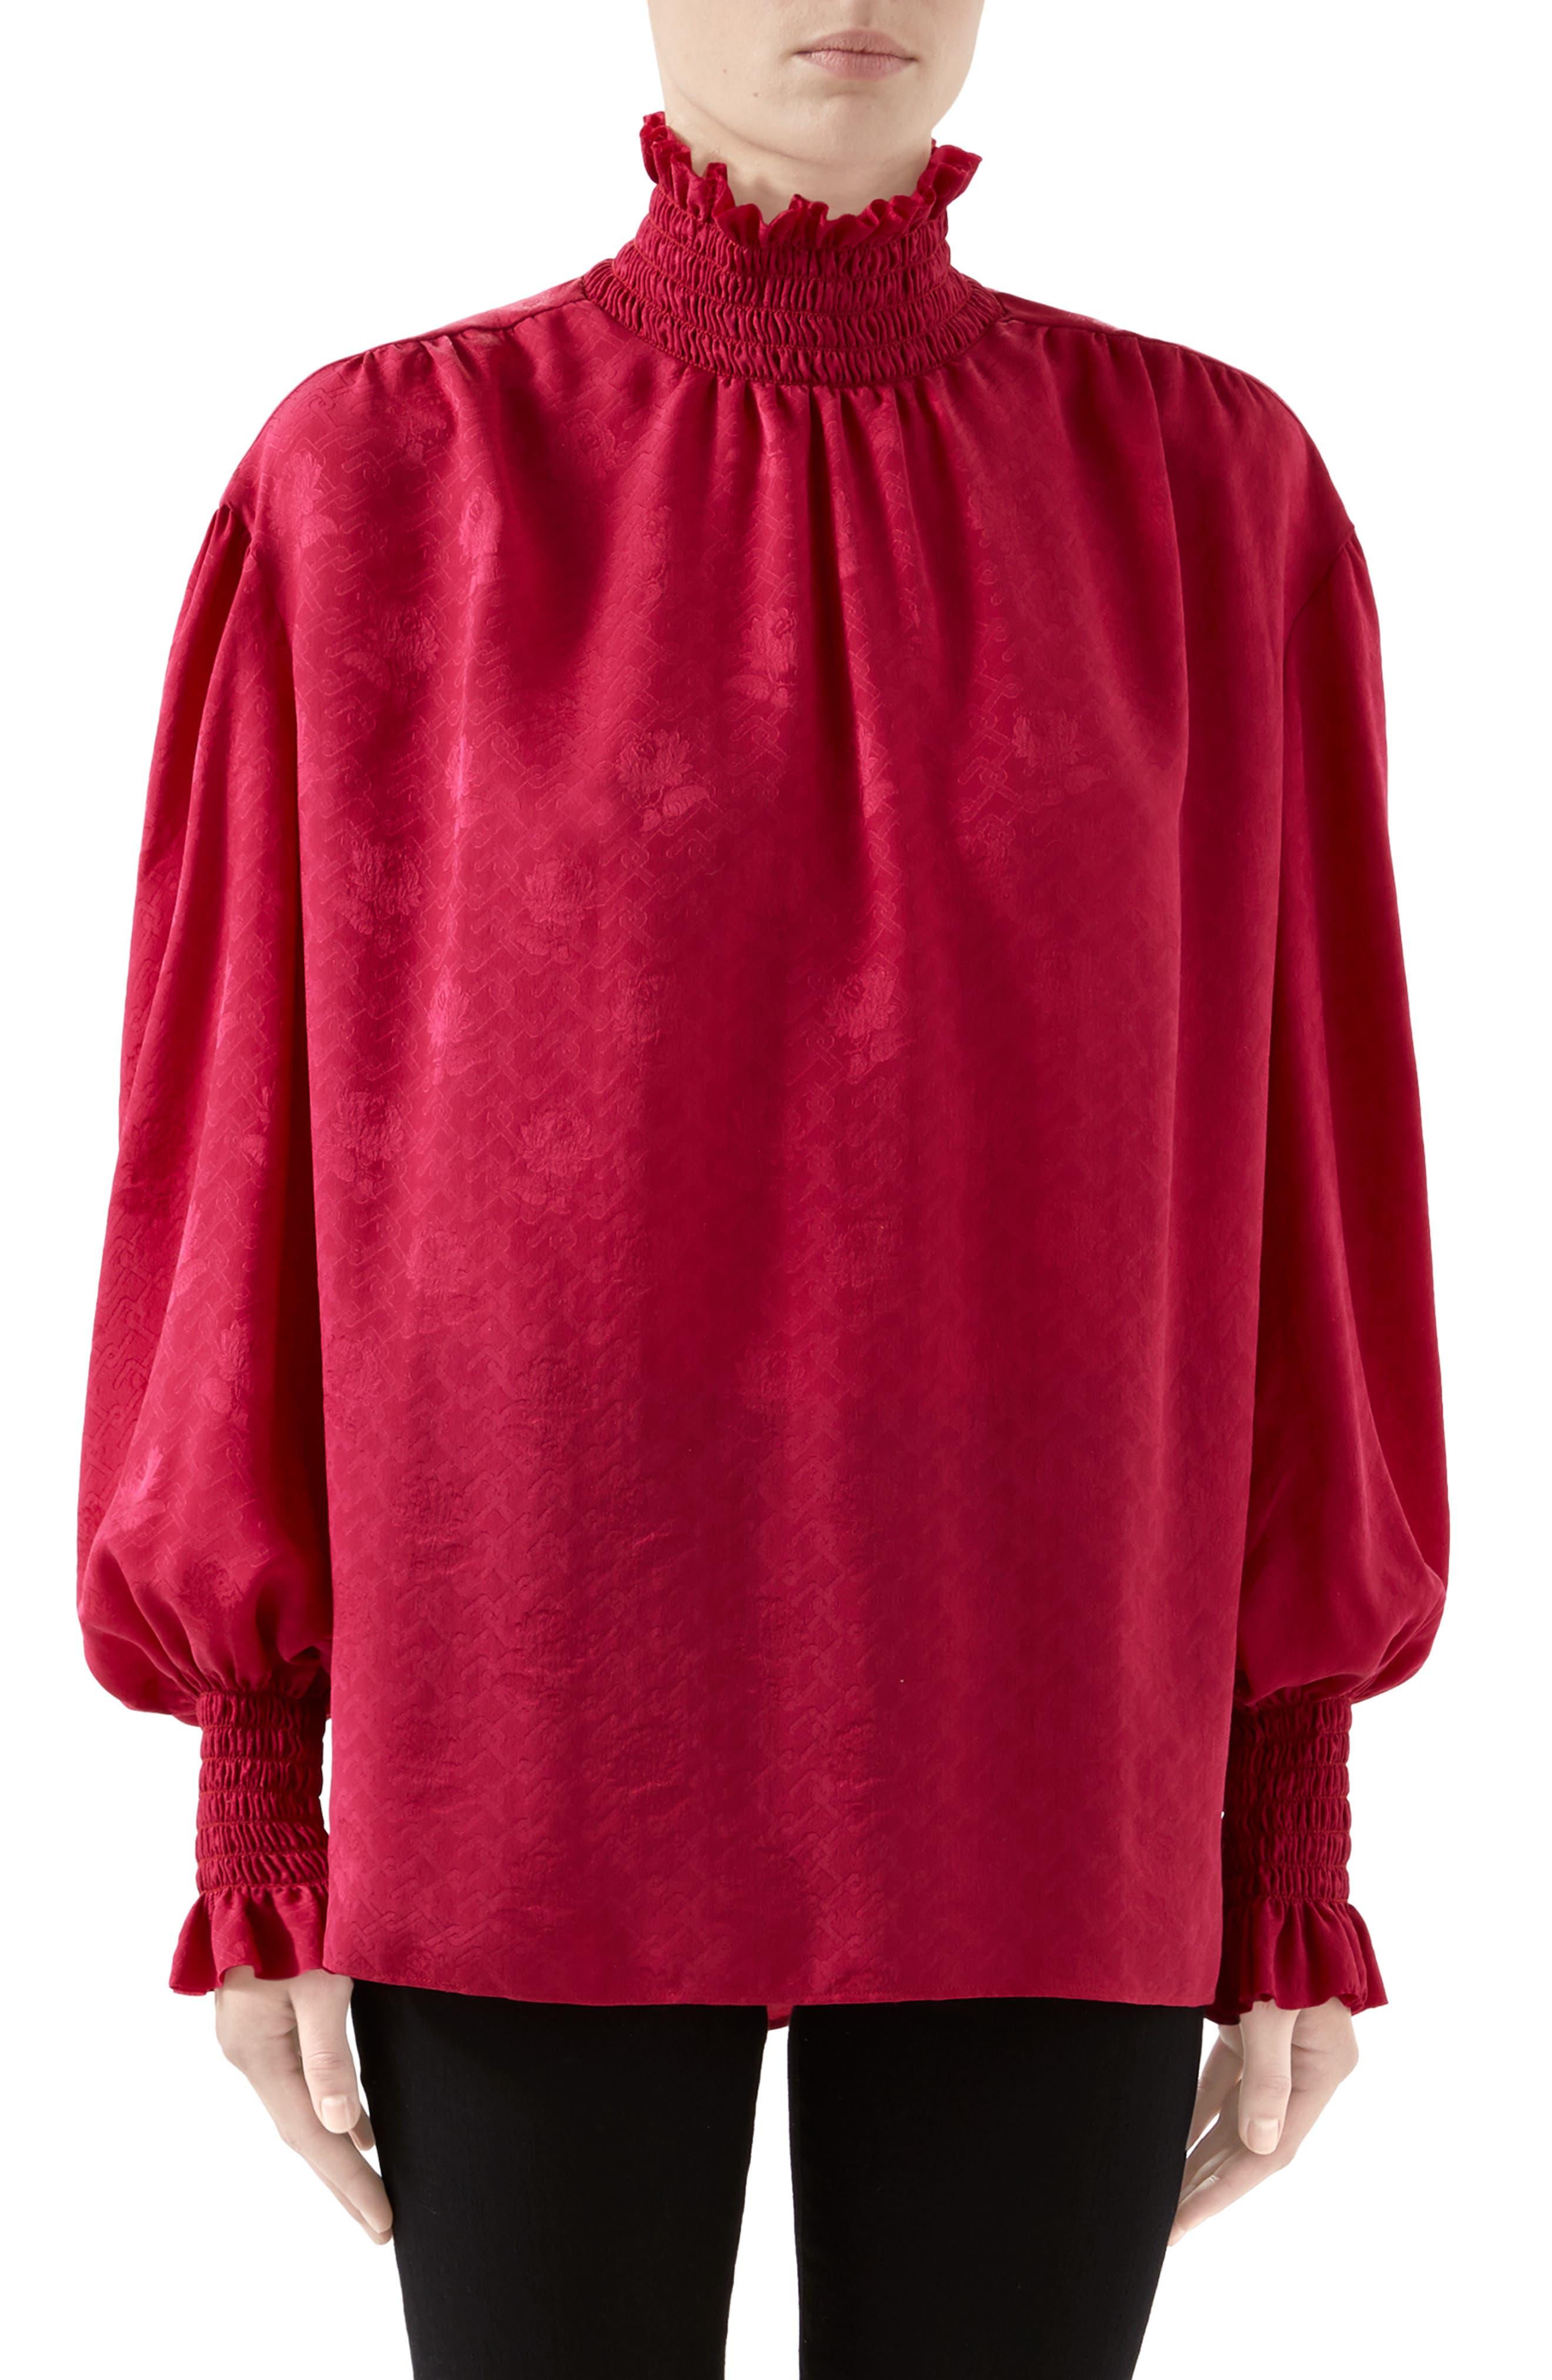 Gucci Tops Rose Jacquard Silk Blouse